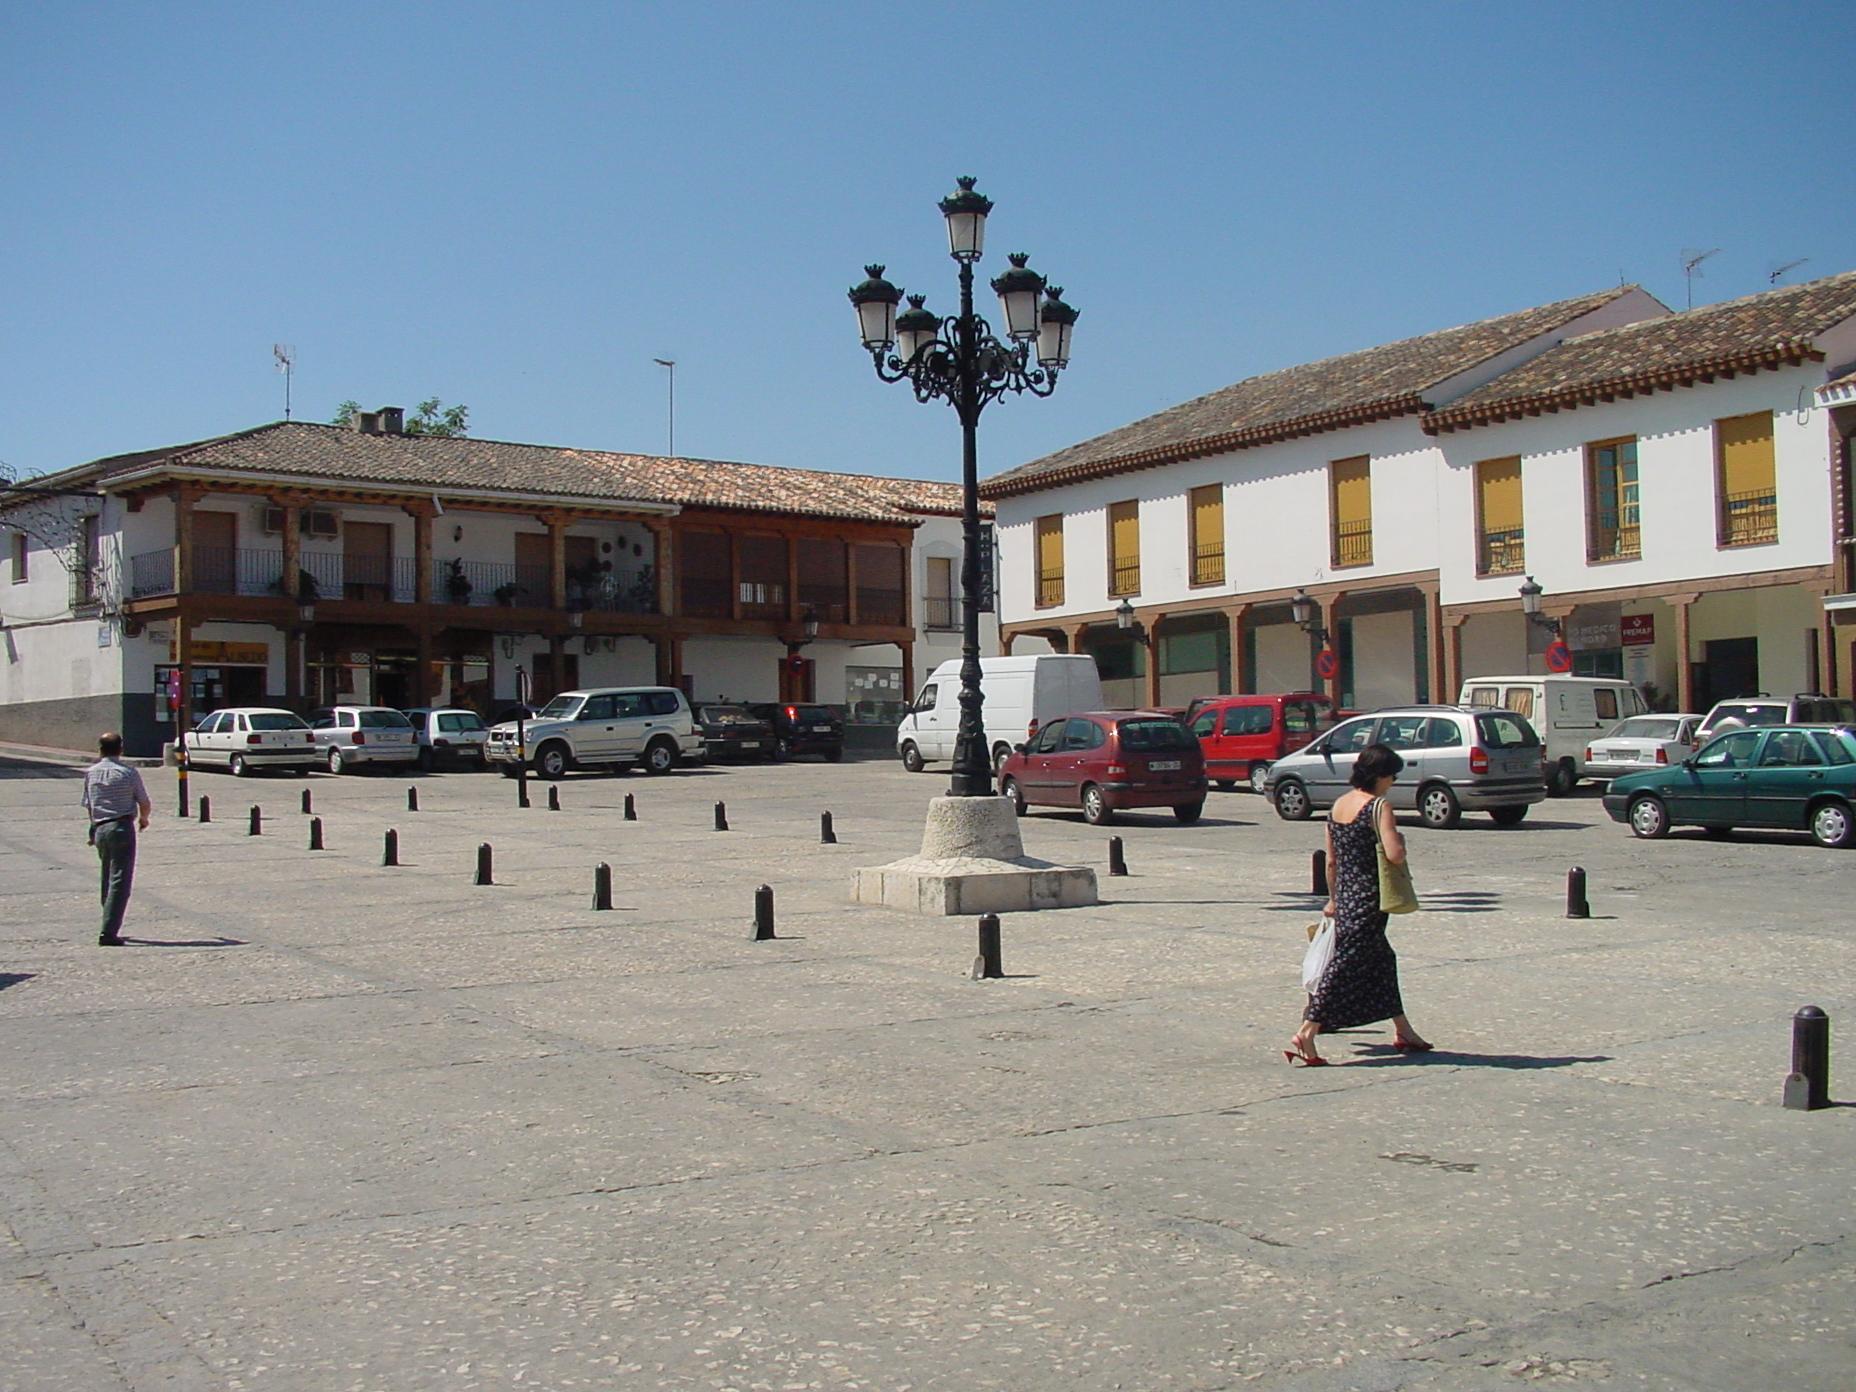 Plaza en Valdemoro